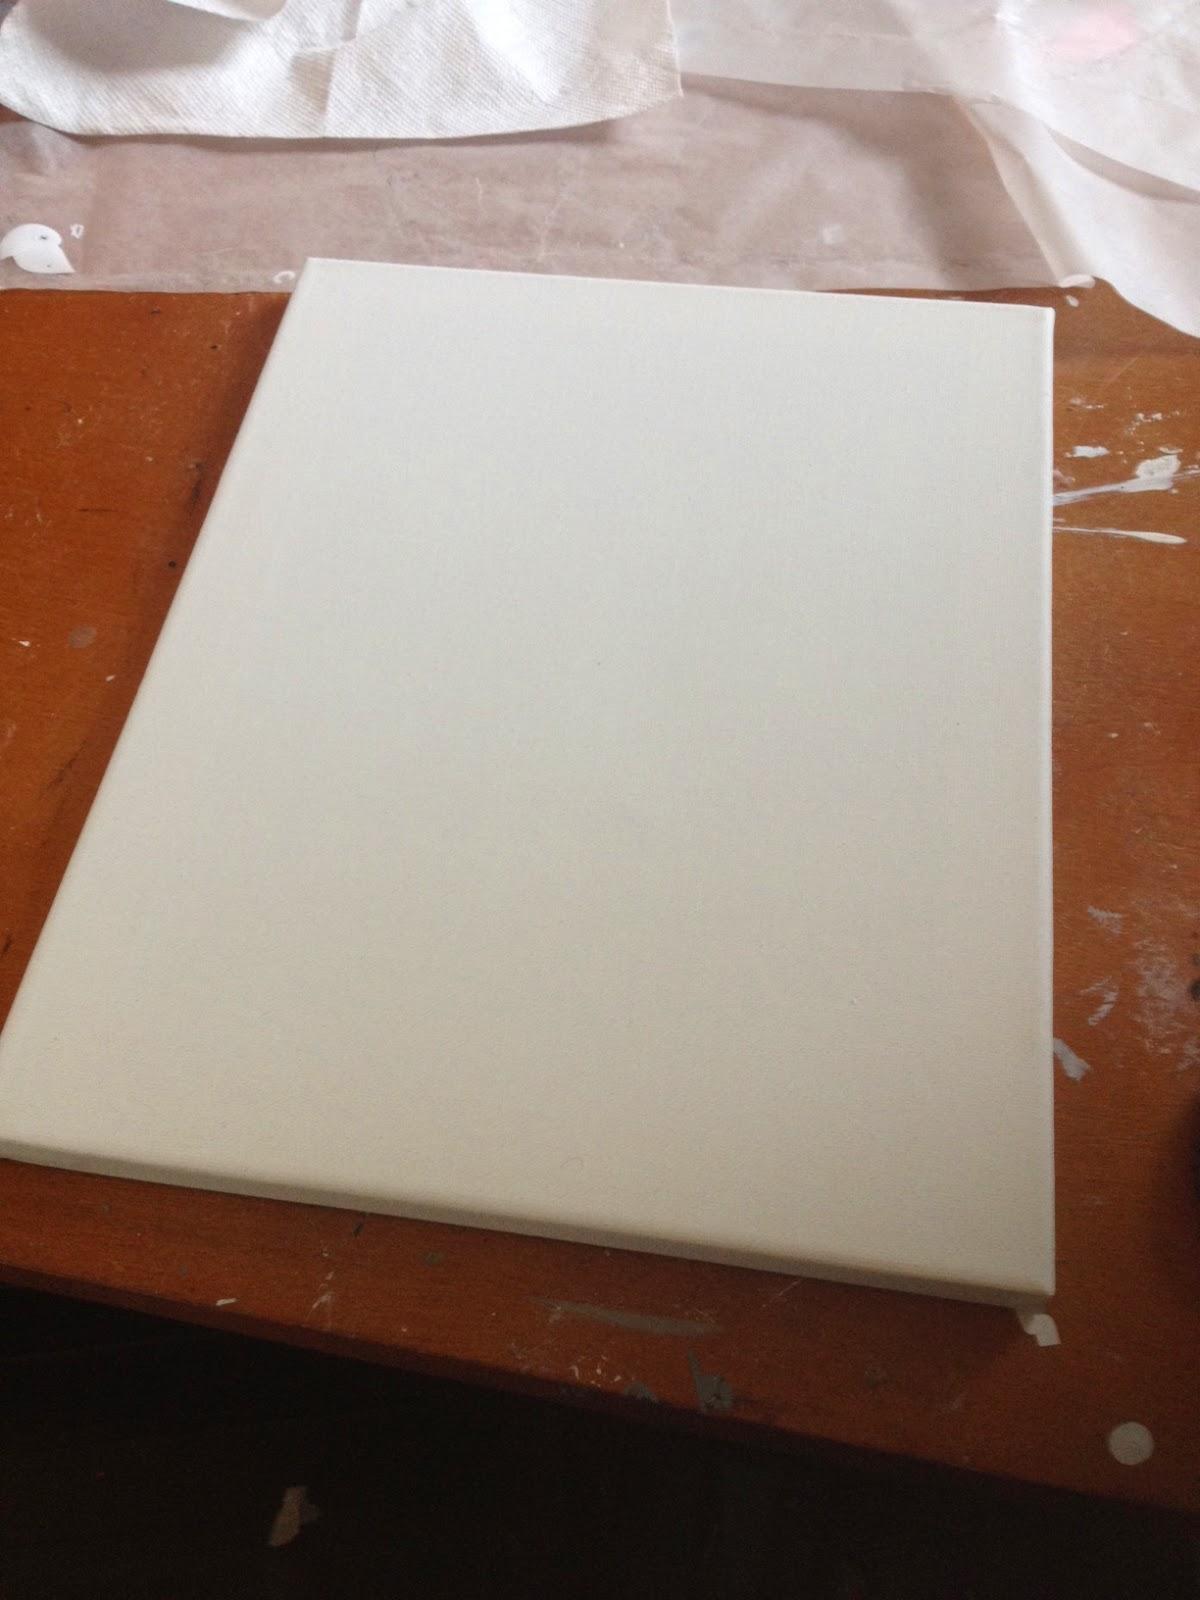 Adhesive vinyl, vinyl adhesive, vinyl on canvas, canvas, silhouette cameo